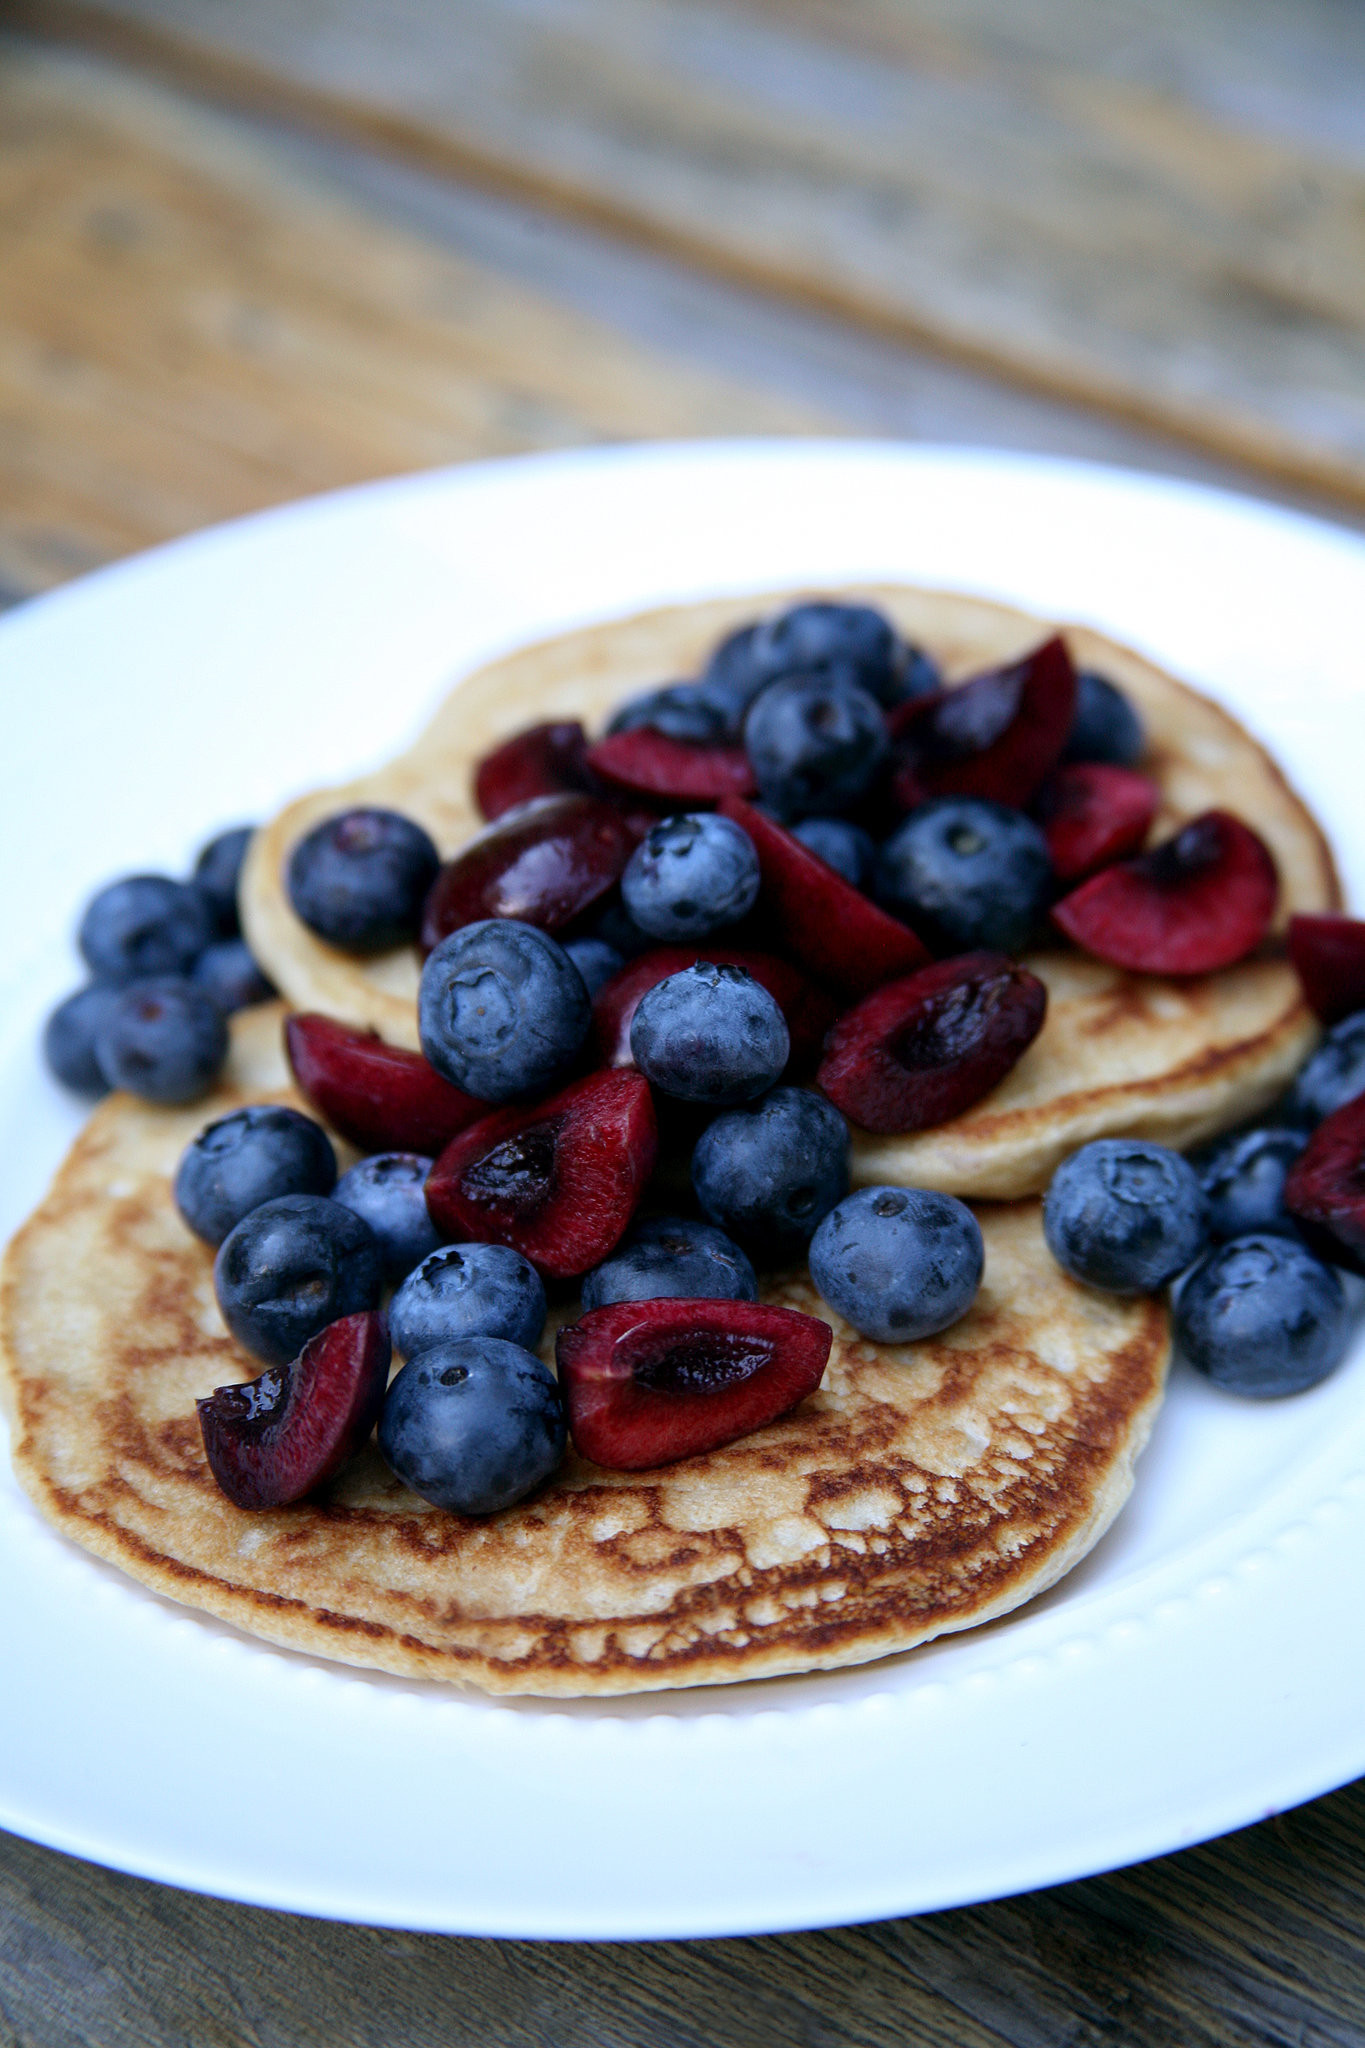 Healthy Vegan Pancakes  Healthy Tasty Vegan Pancakes Recipe 100 Calories